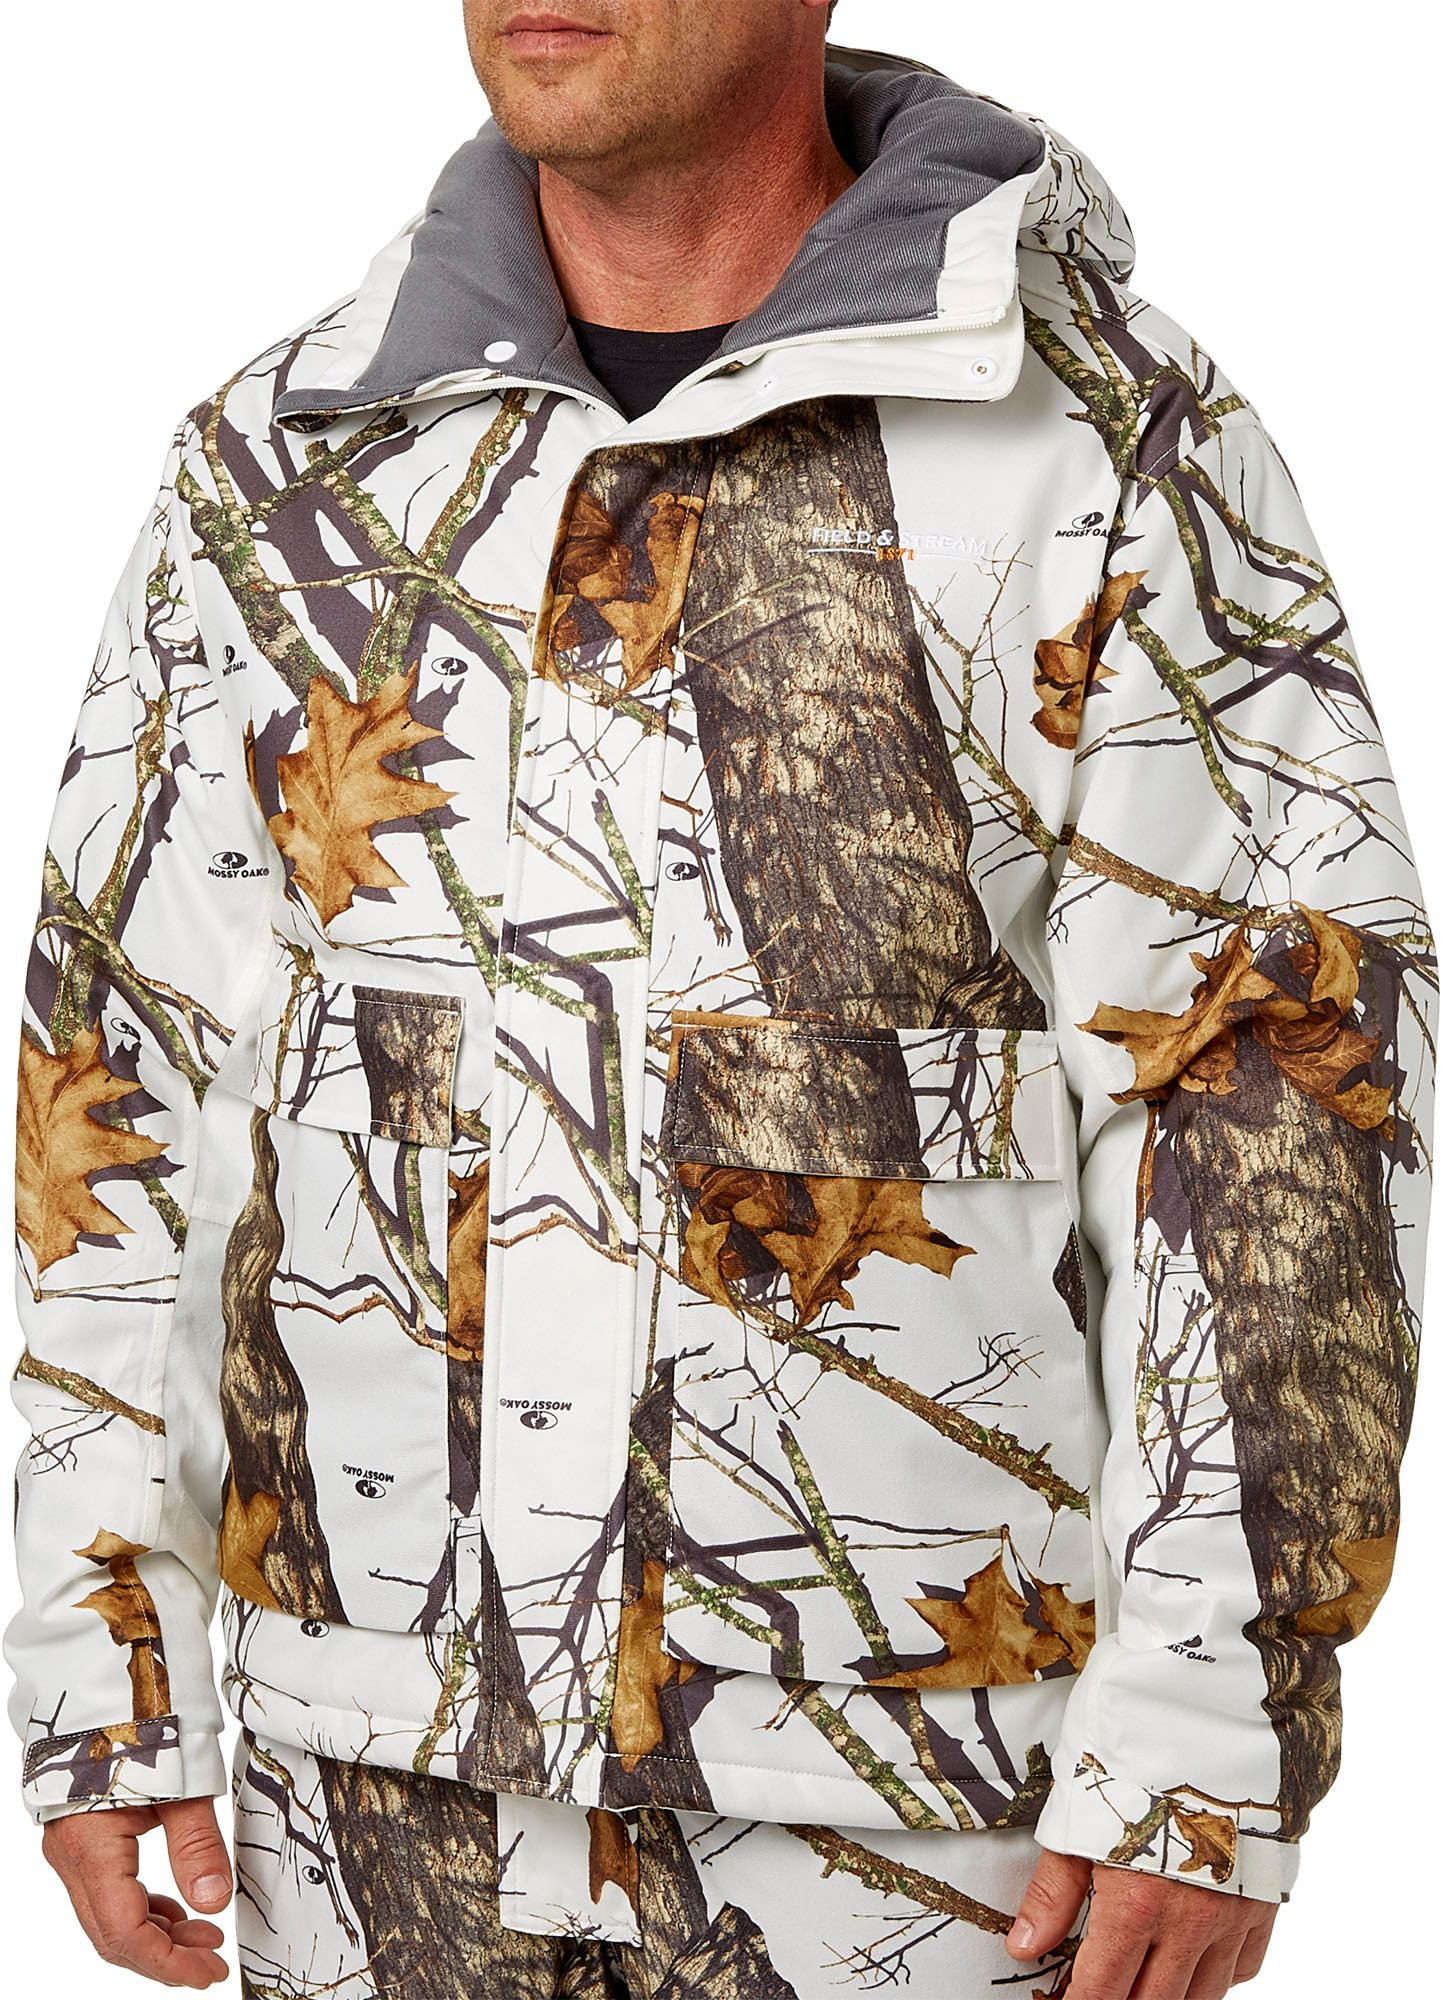 Field & Stream Men's True Pursuit Insulated Hunting Jacket, Medium, Mossy Oak Winter